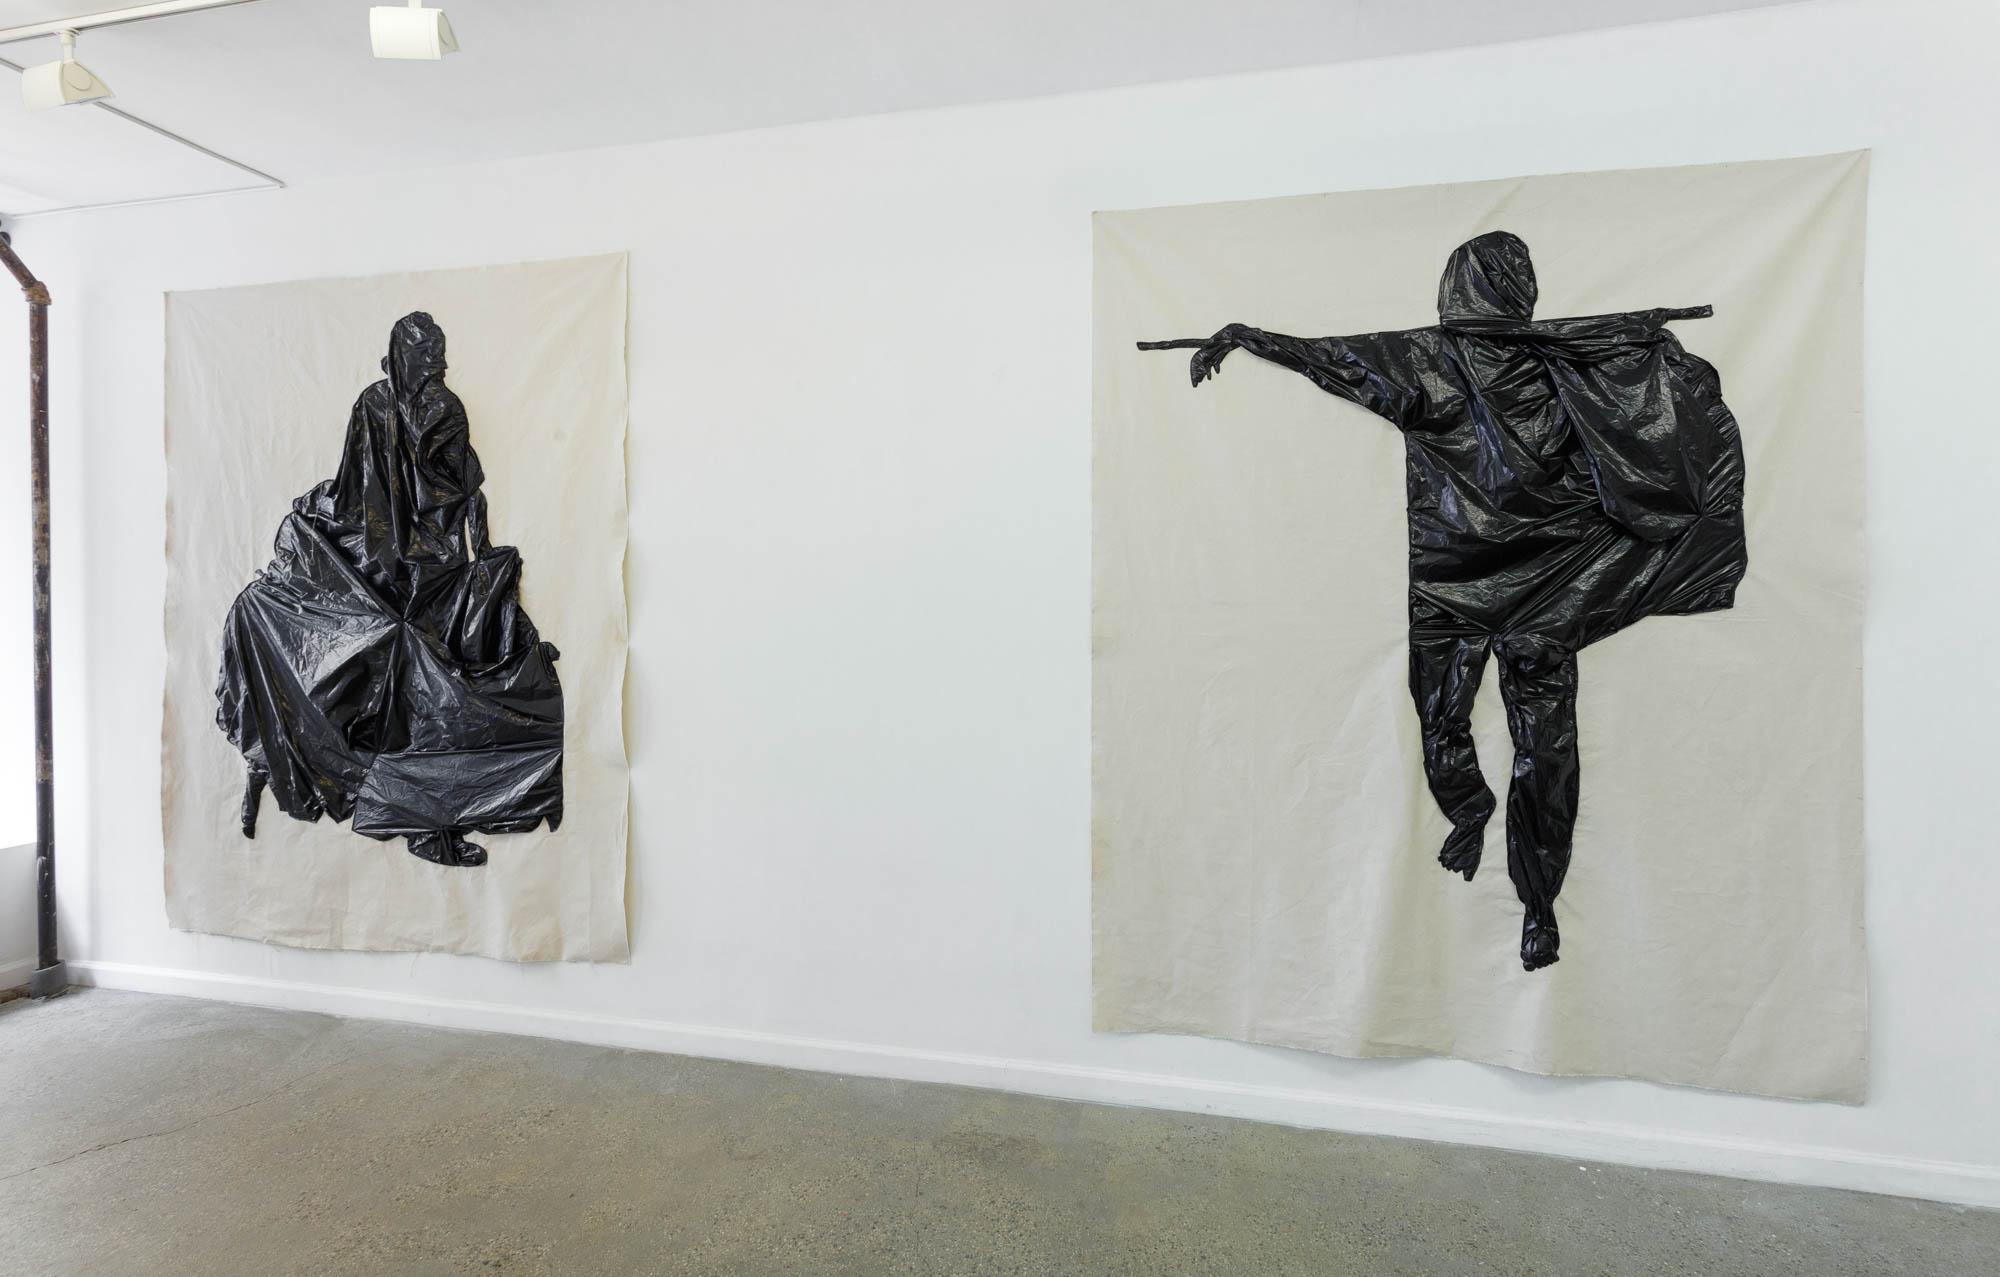 Fanny Allié's Woman-Lost Shoe, 2018 (left) and Man-Bare Feet, 2018 (right)